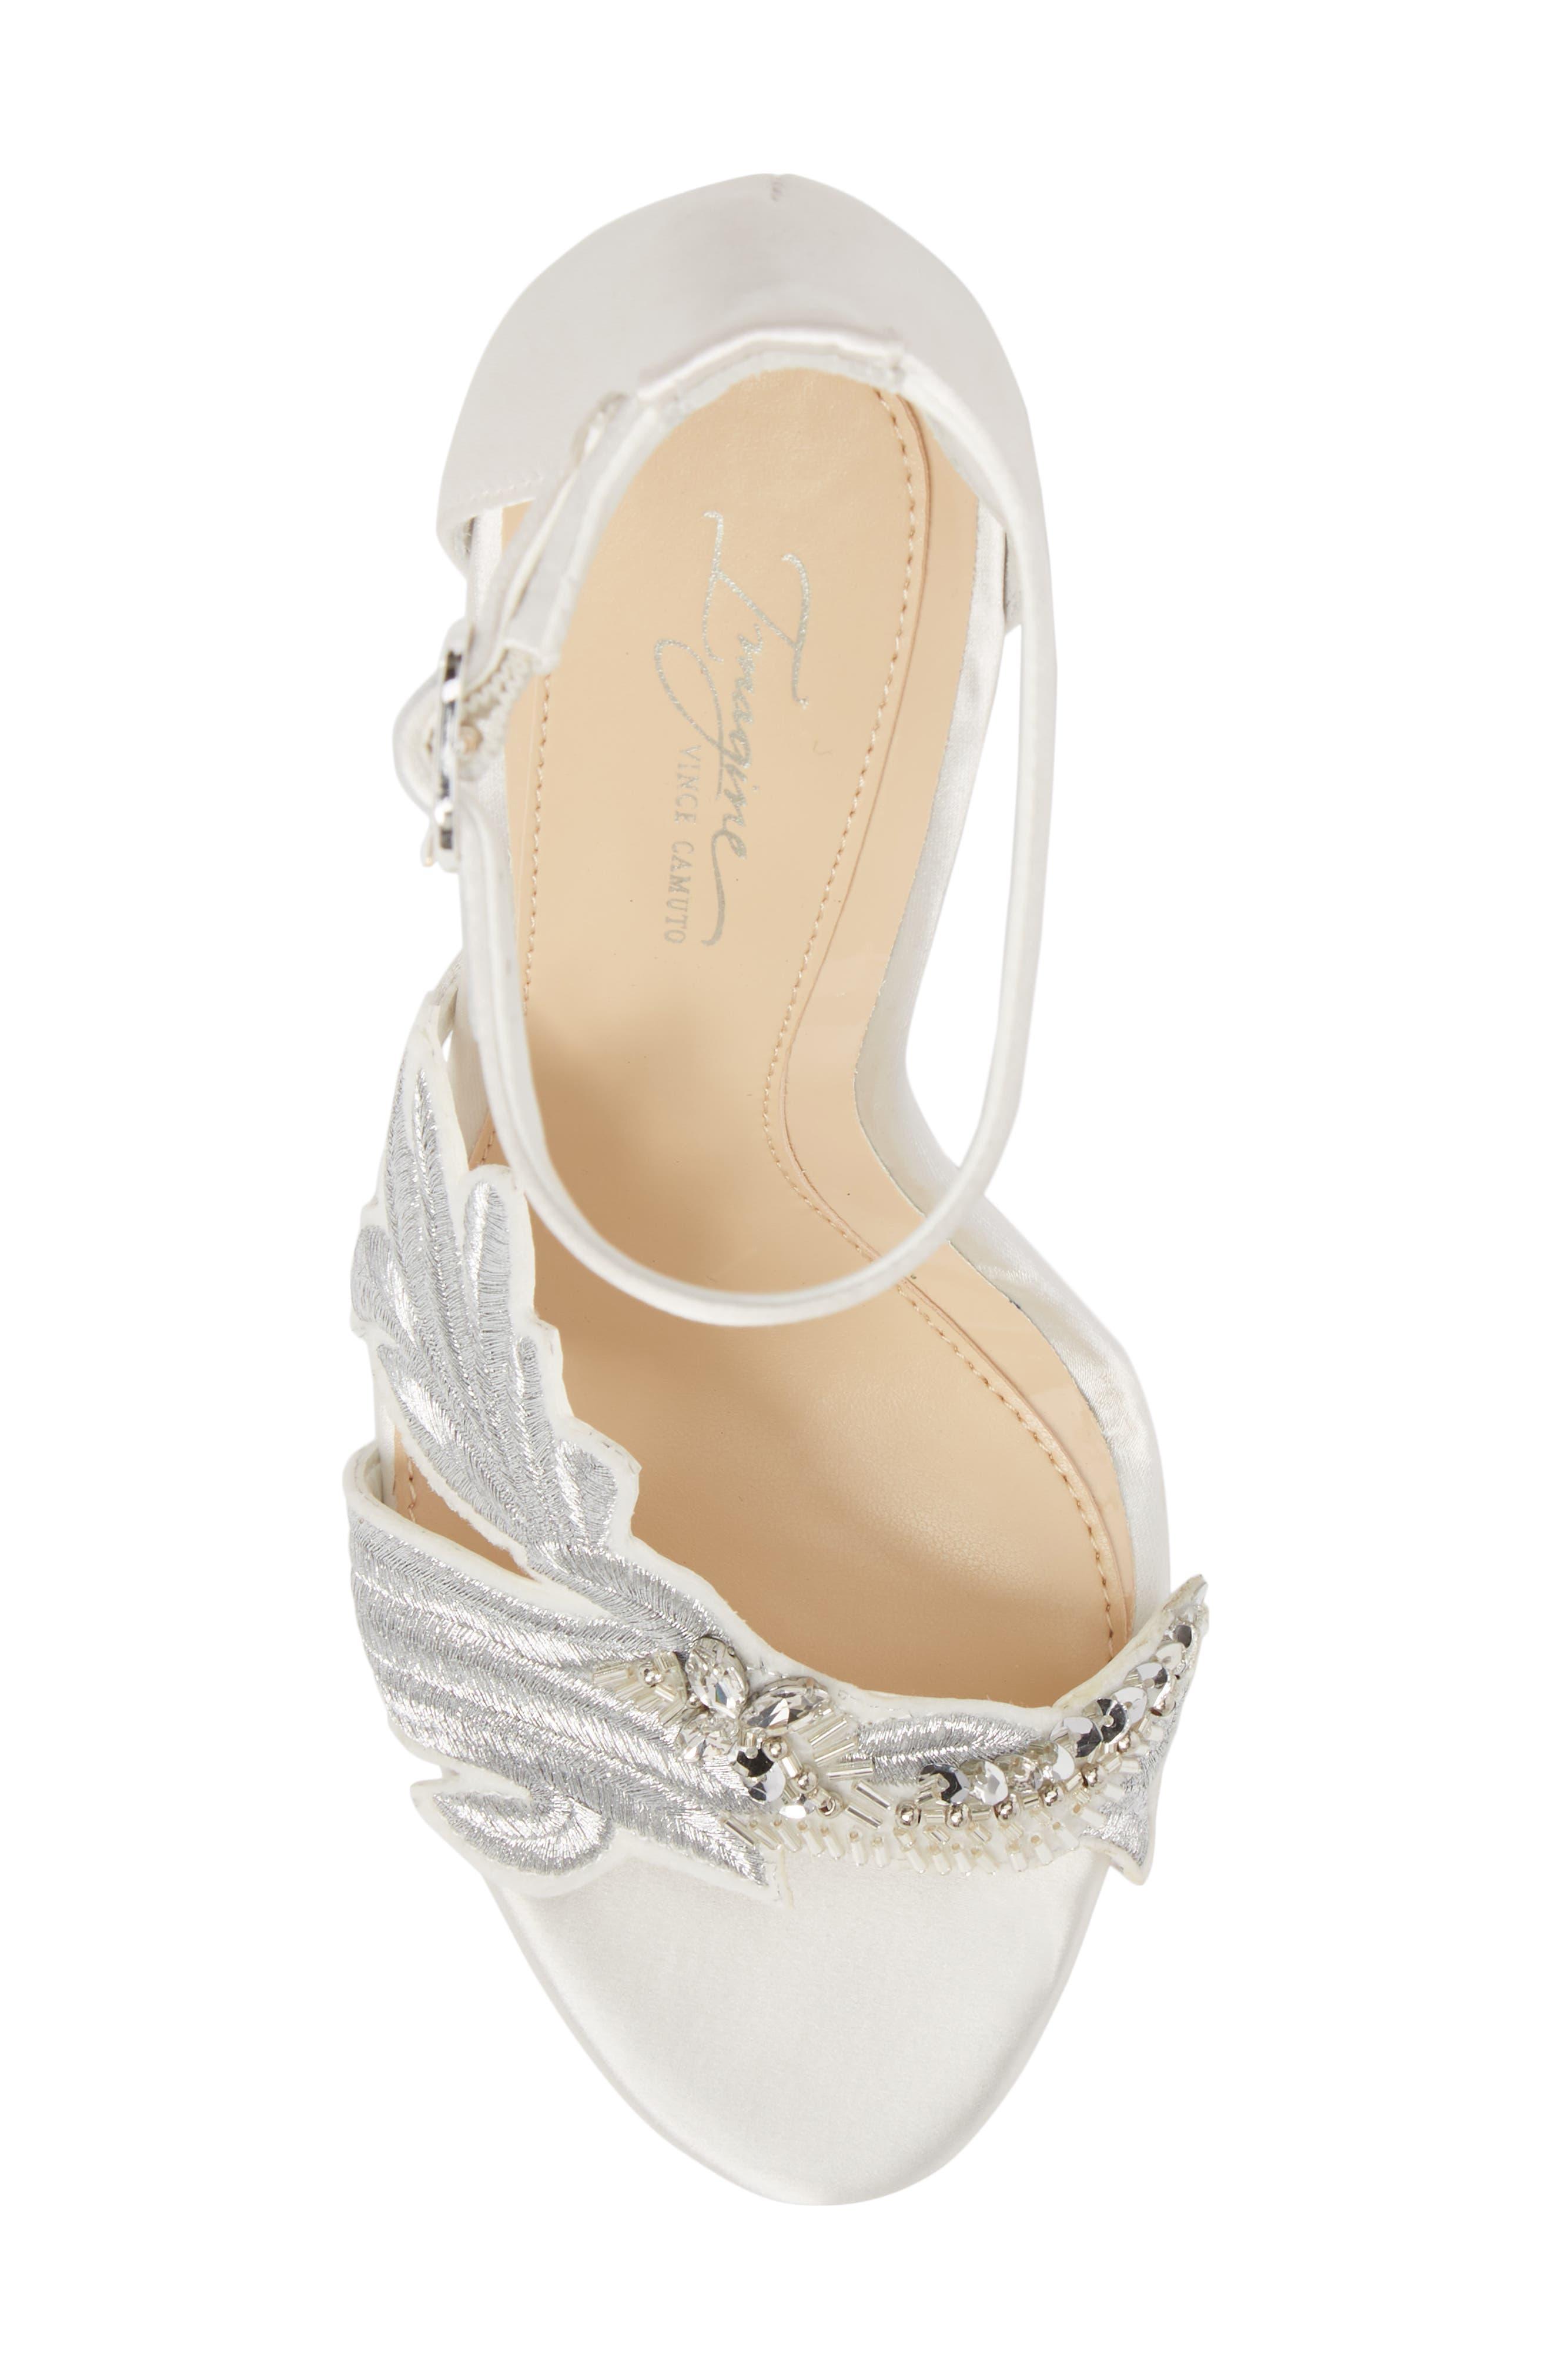 Imagine Vince Camuto Dayanara Embellished Sandal,                             Alternate thumbnail 5, color,                             PURE WHITE SATIN